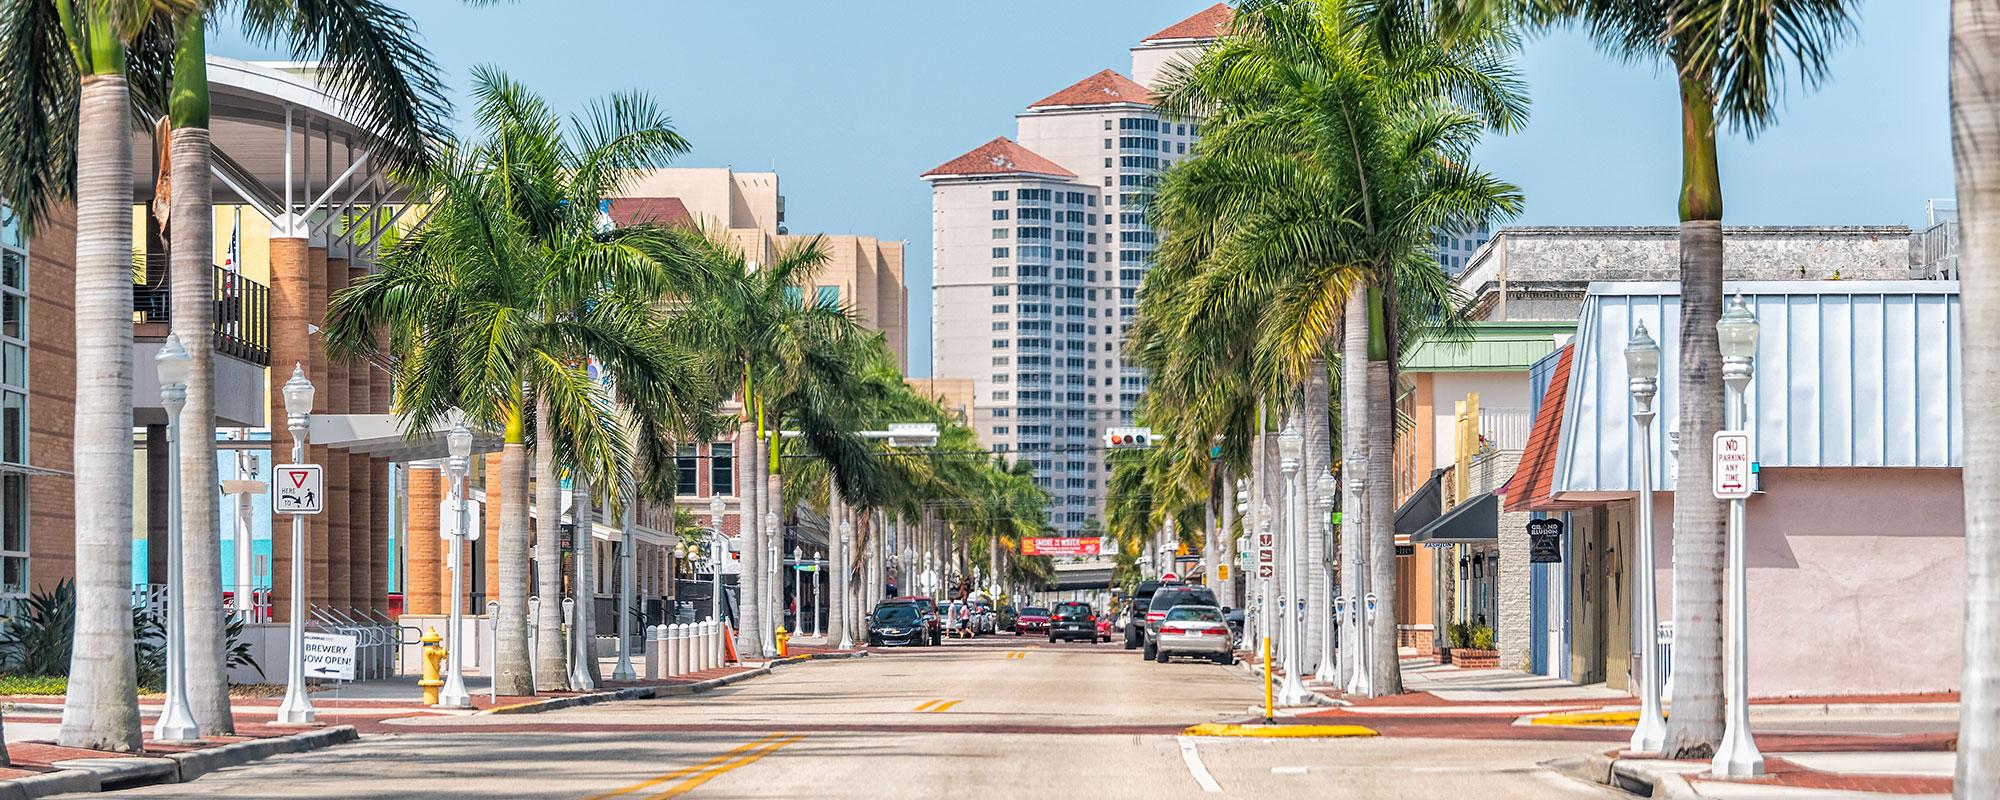 Southwest Florida 2042631583.jpg